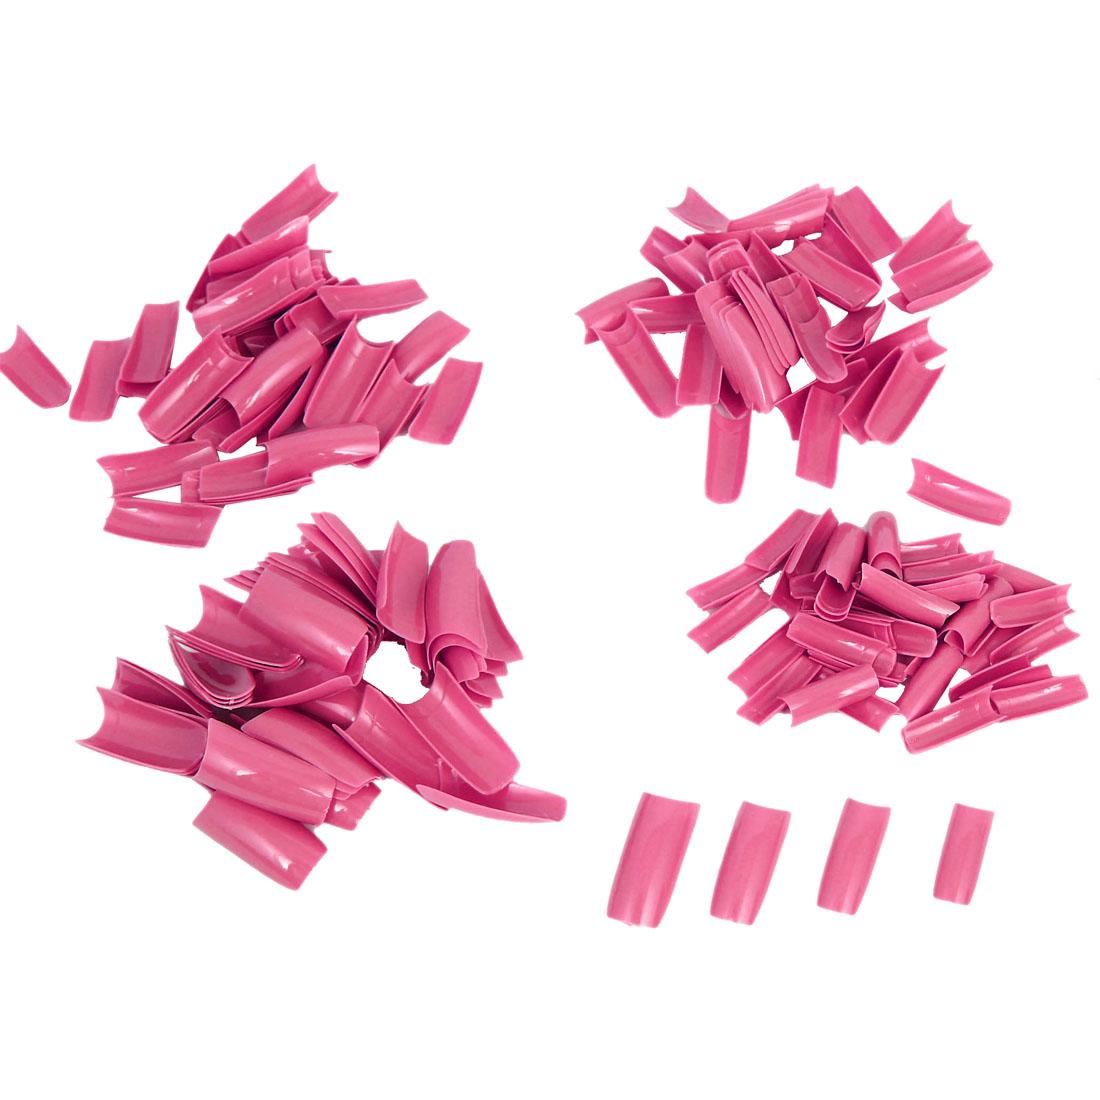 Women Fuchsia Plastic DIY False Nail Art Decal Stickers Tip Decoration 250 Pcs